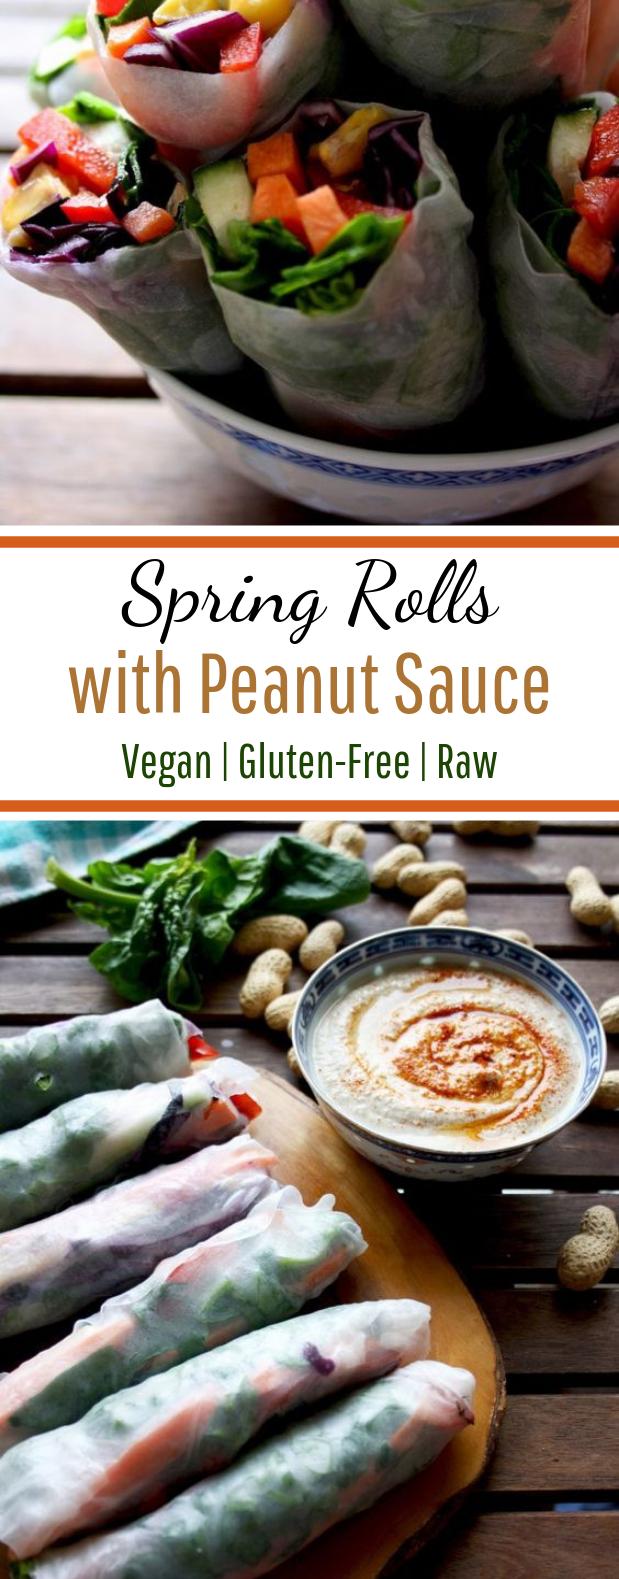 Fresh Vegan Spring Rolls with Peanut Sauce #plantbased #vegetarian